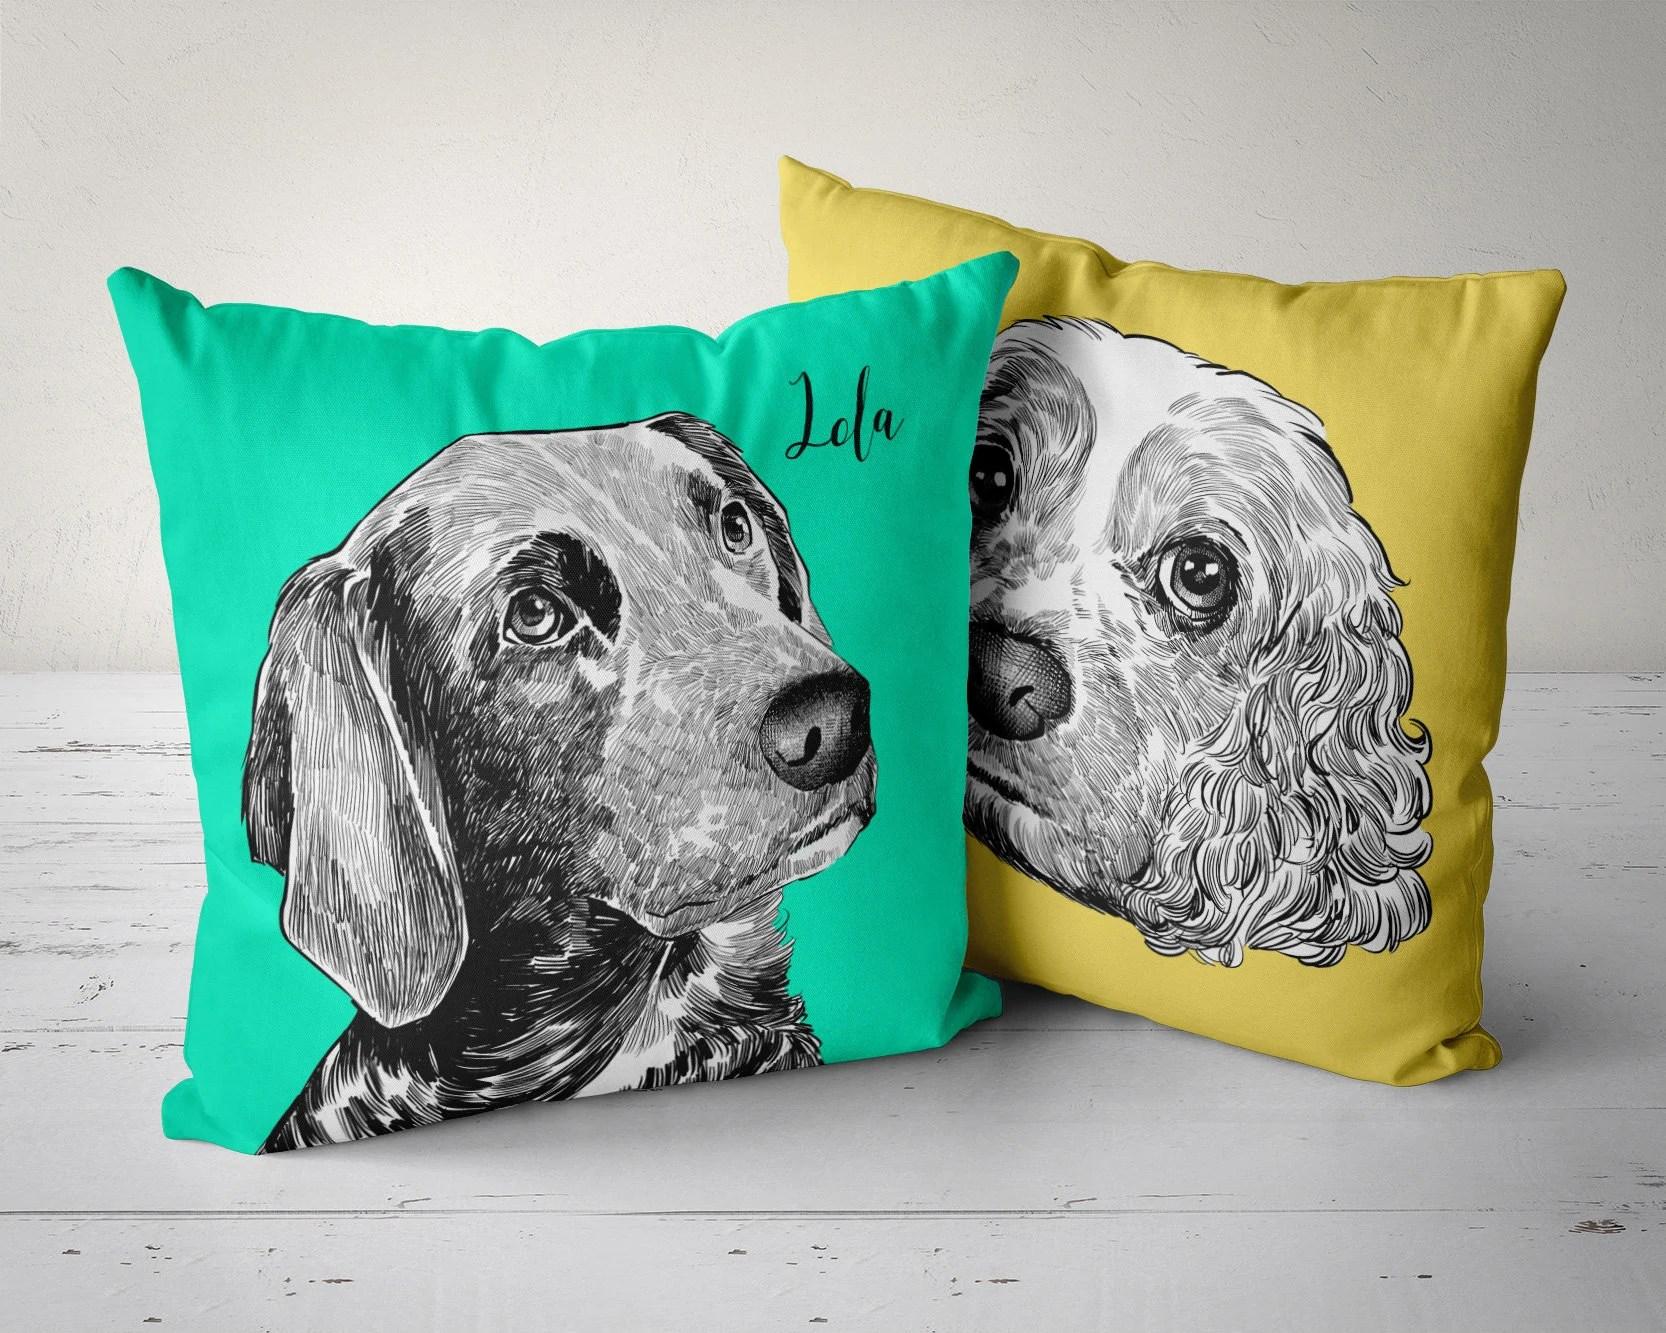 pet pillow personalized pet pillow custom pet pillow customized dog pillow dog portrait pillow custom throw pillows cases pillow cover